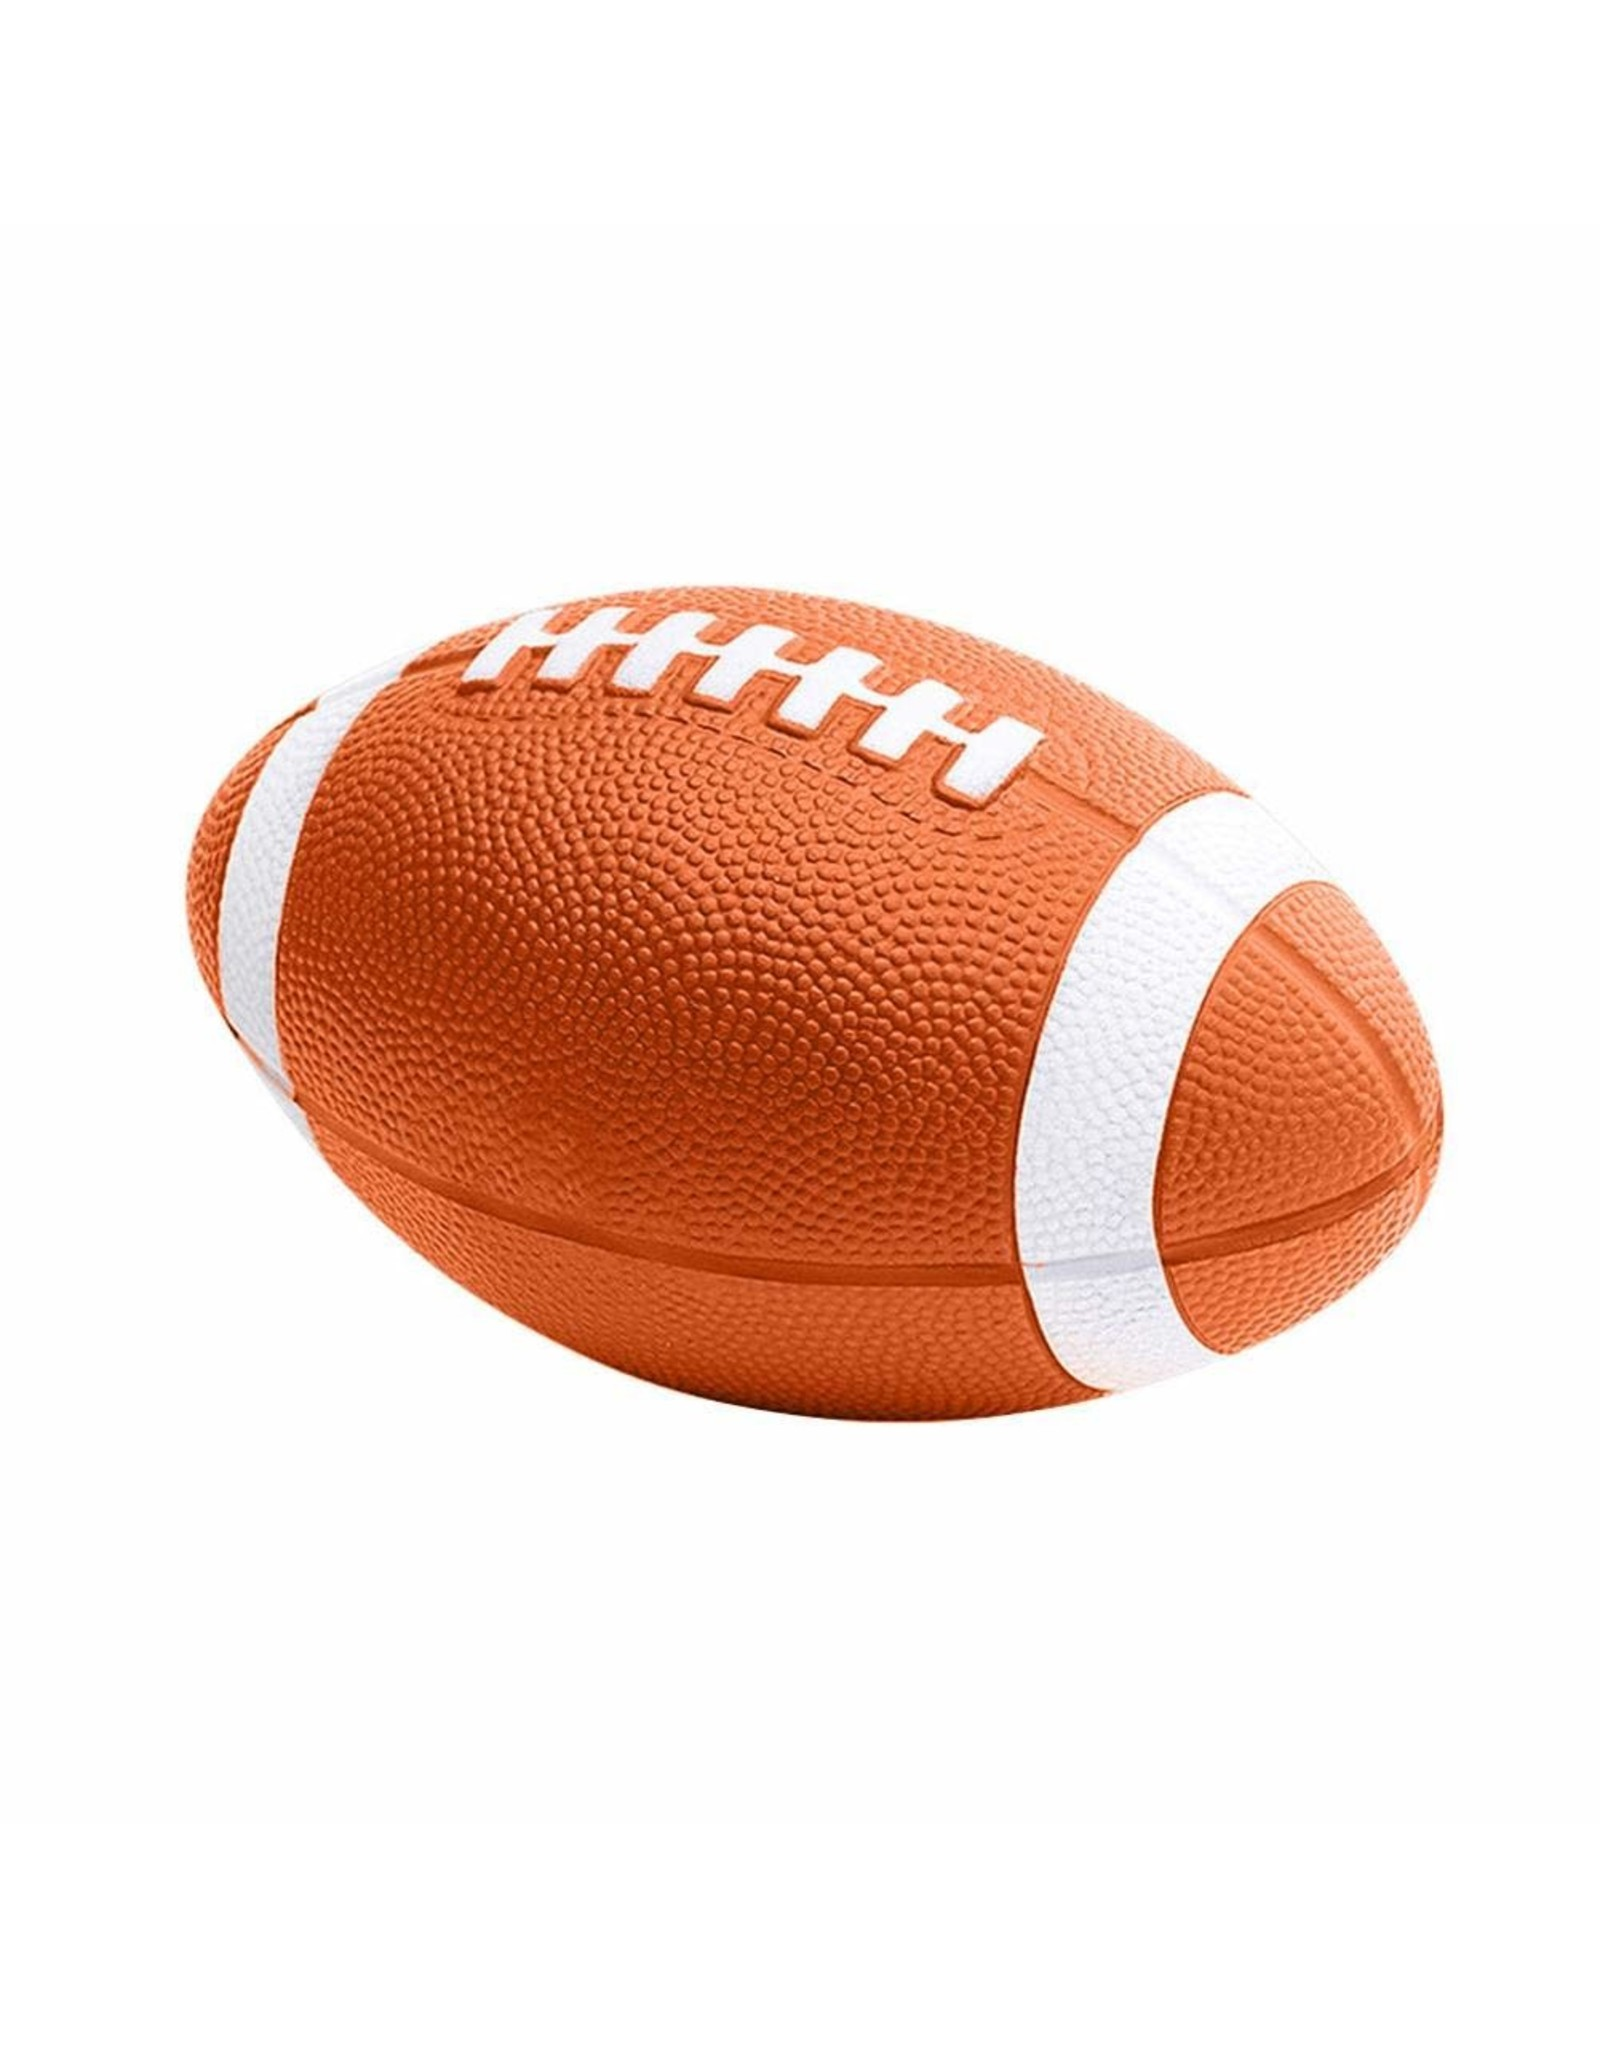 American Football size 9